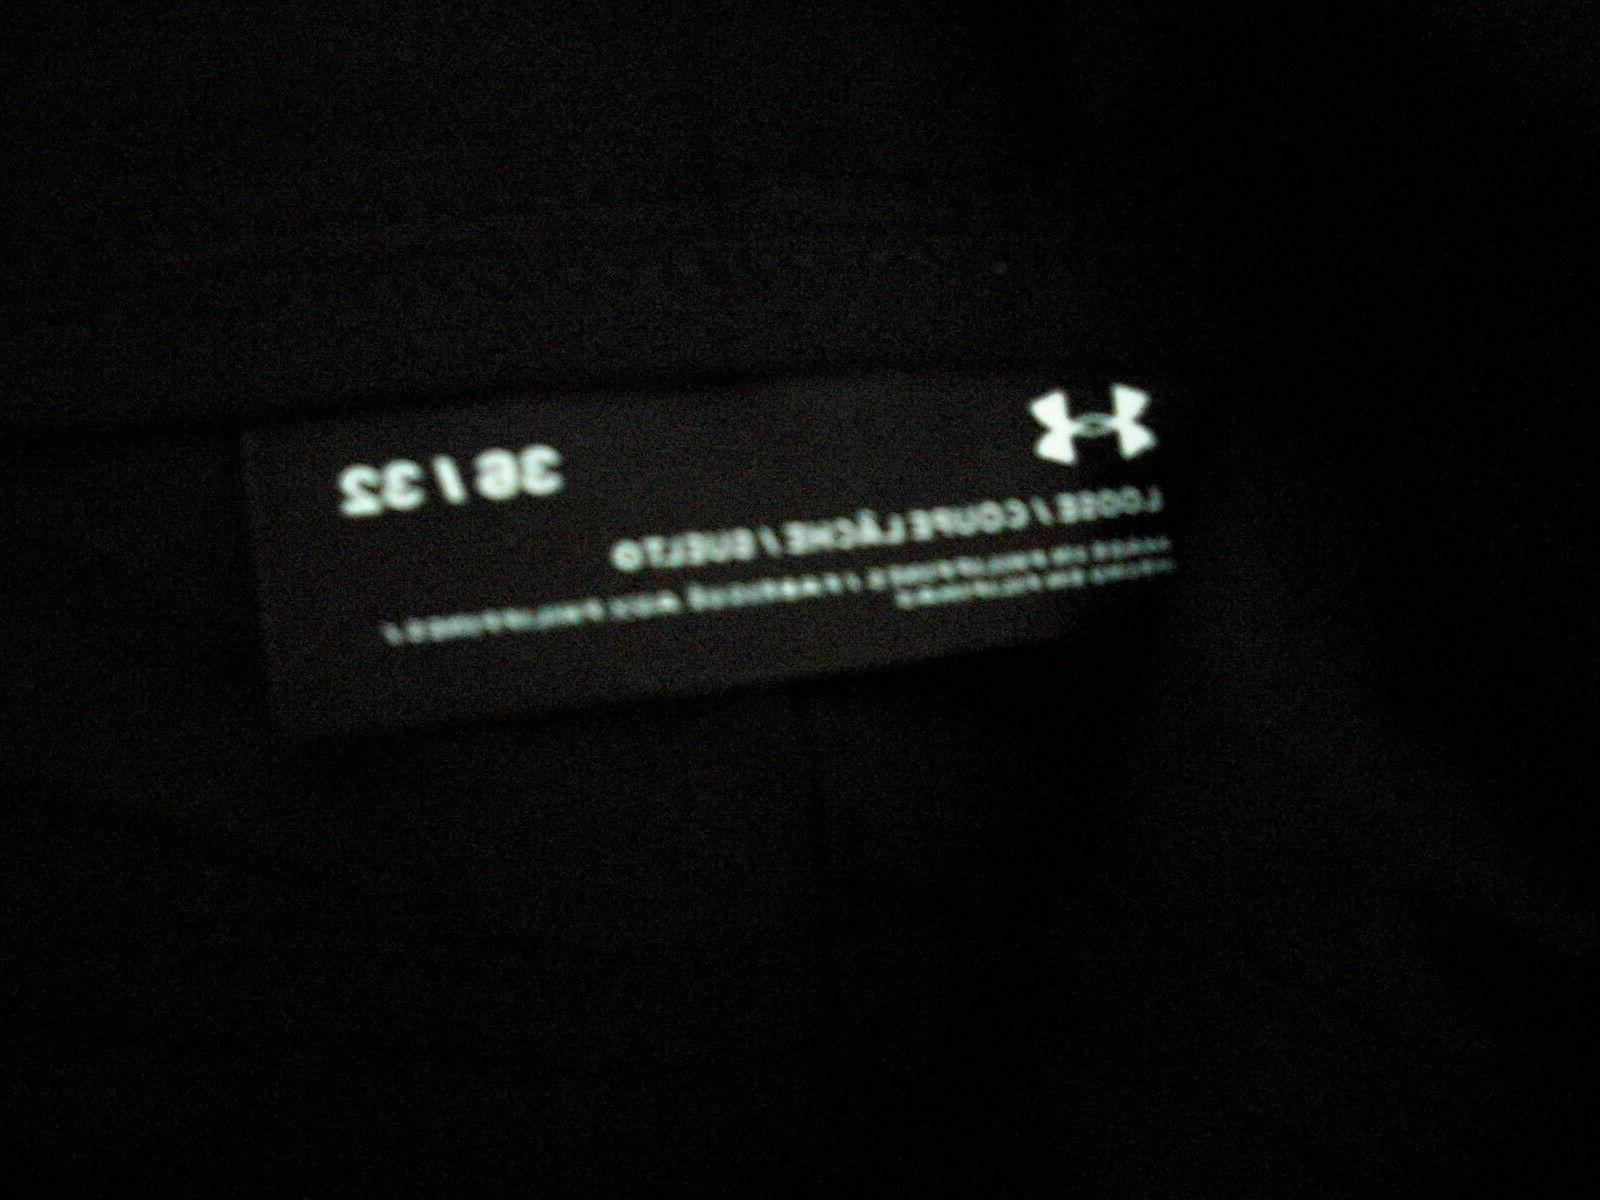 UNDER Loose Fit Water Resistant Pants/Jeans 36x32